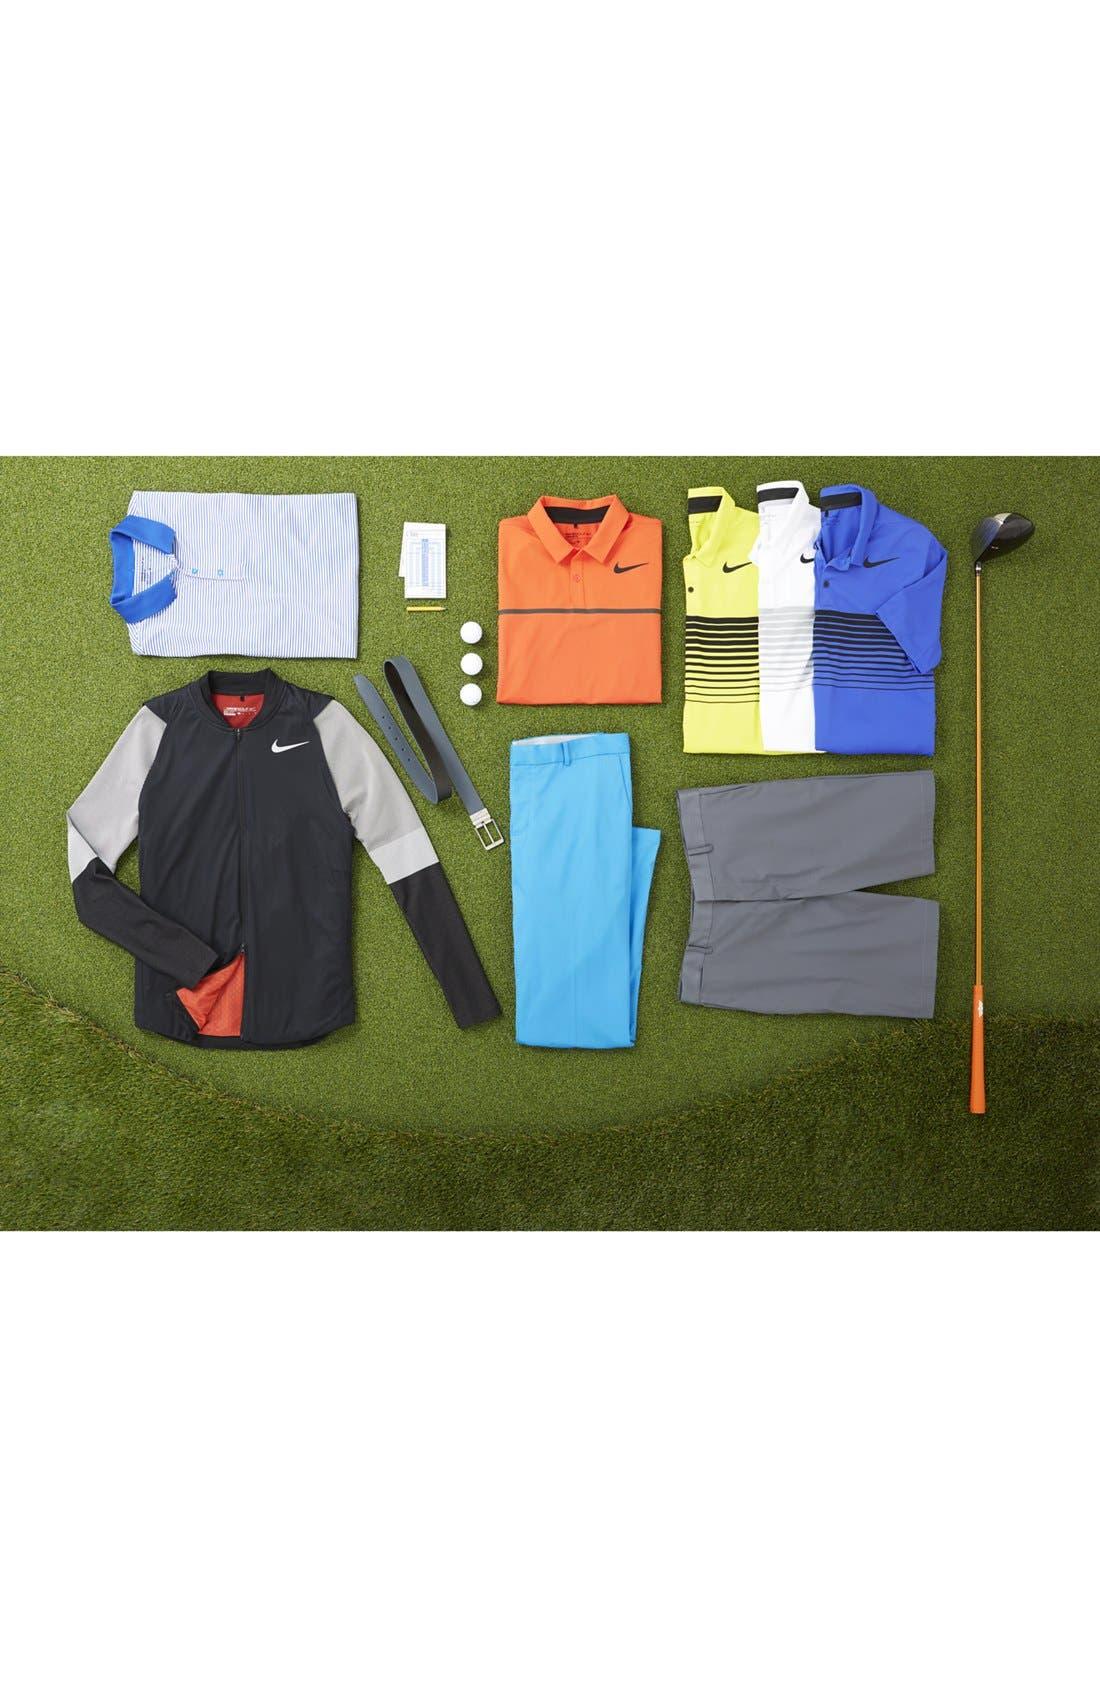 Flat Front Dri-FIT Tech Golf Pants,                             Alternate thumbnail 8, color,                             LIGHT BONE/ LIGHT BONE